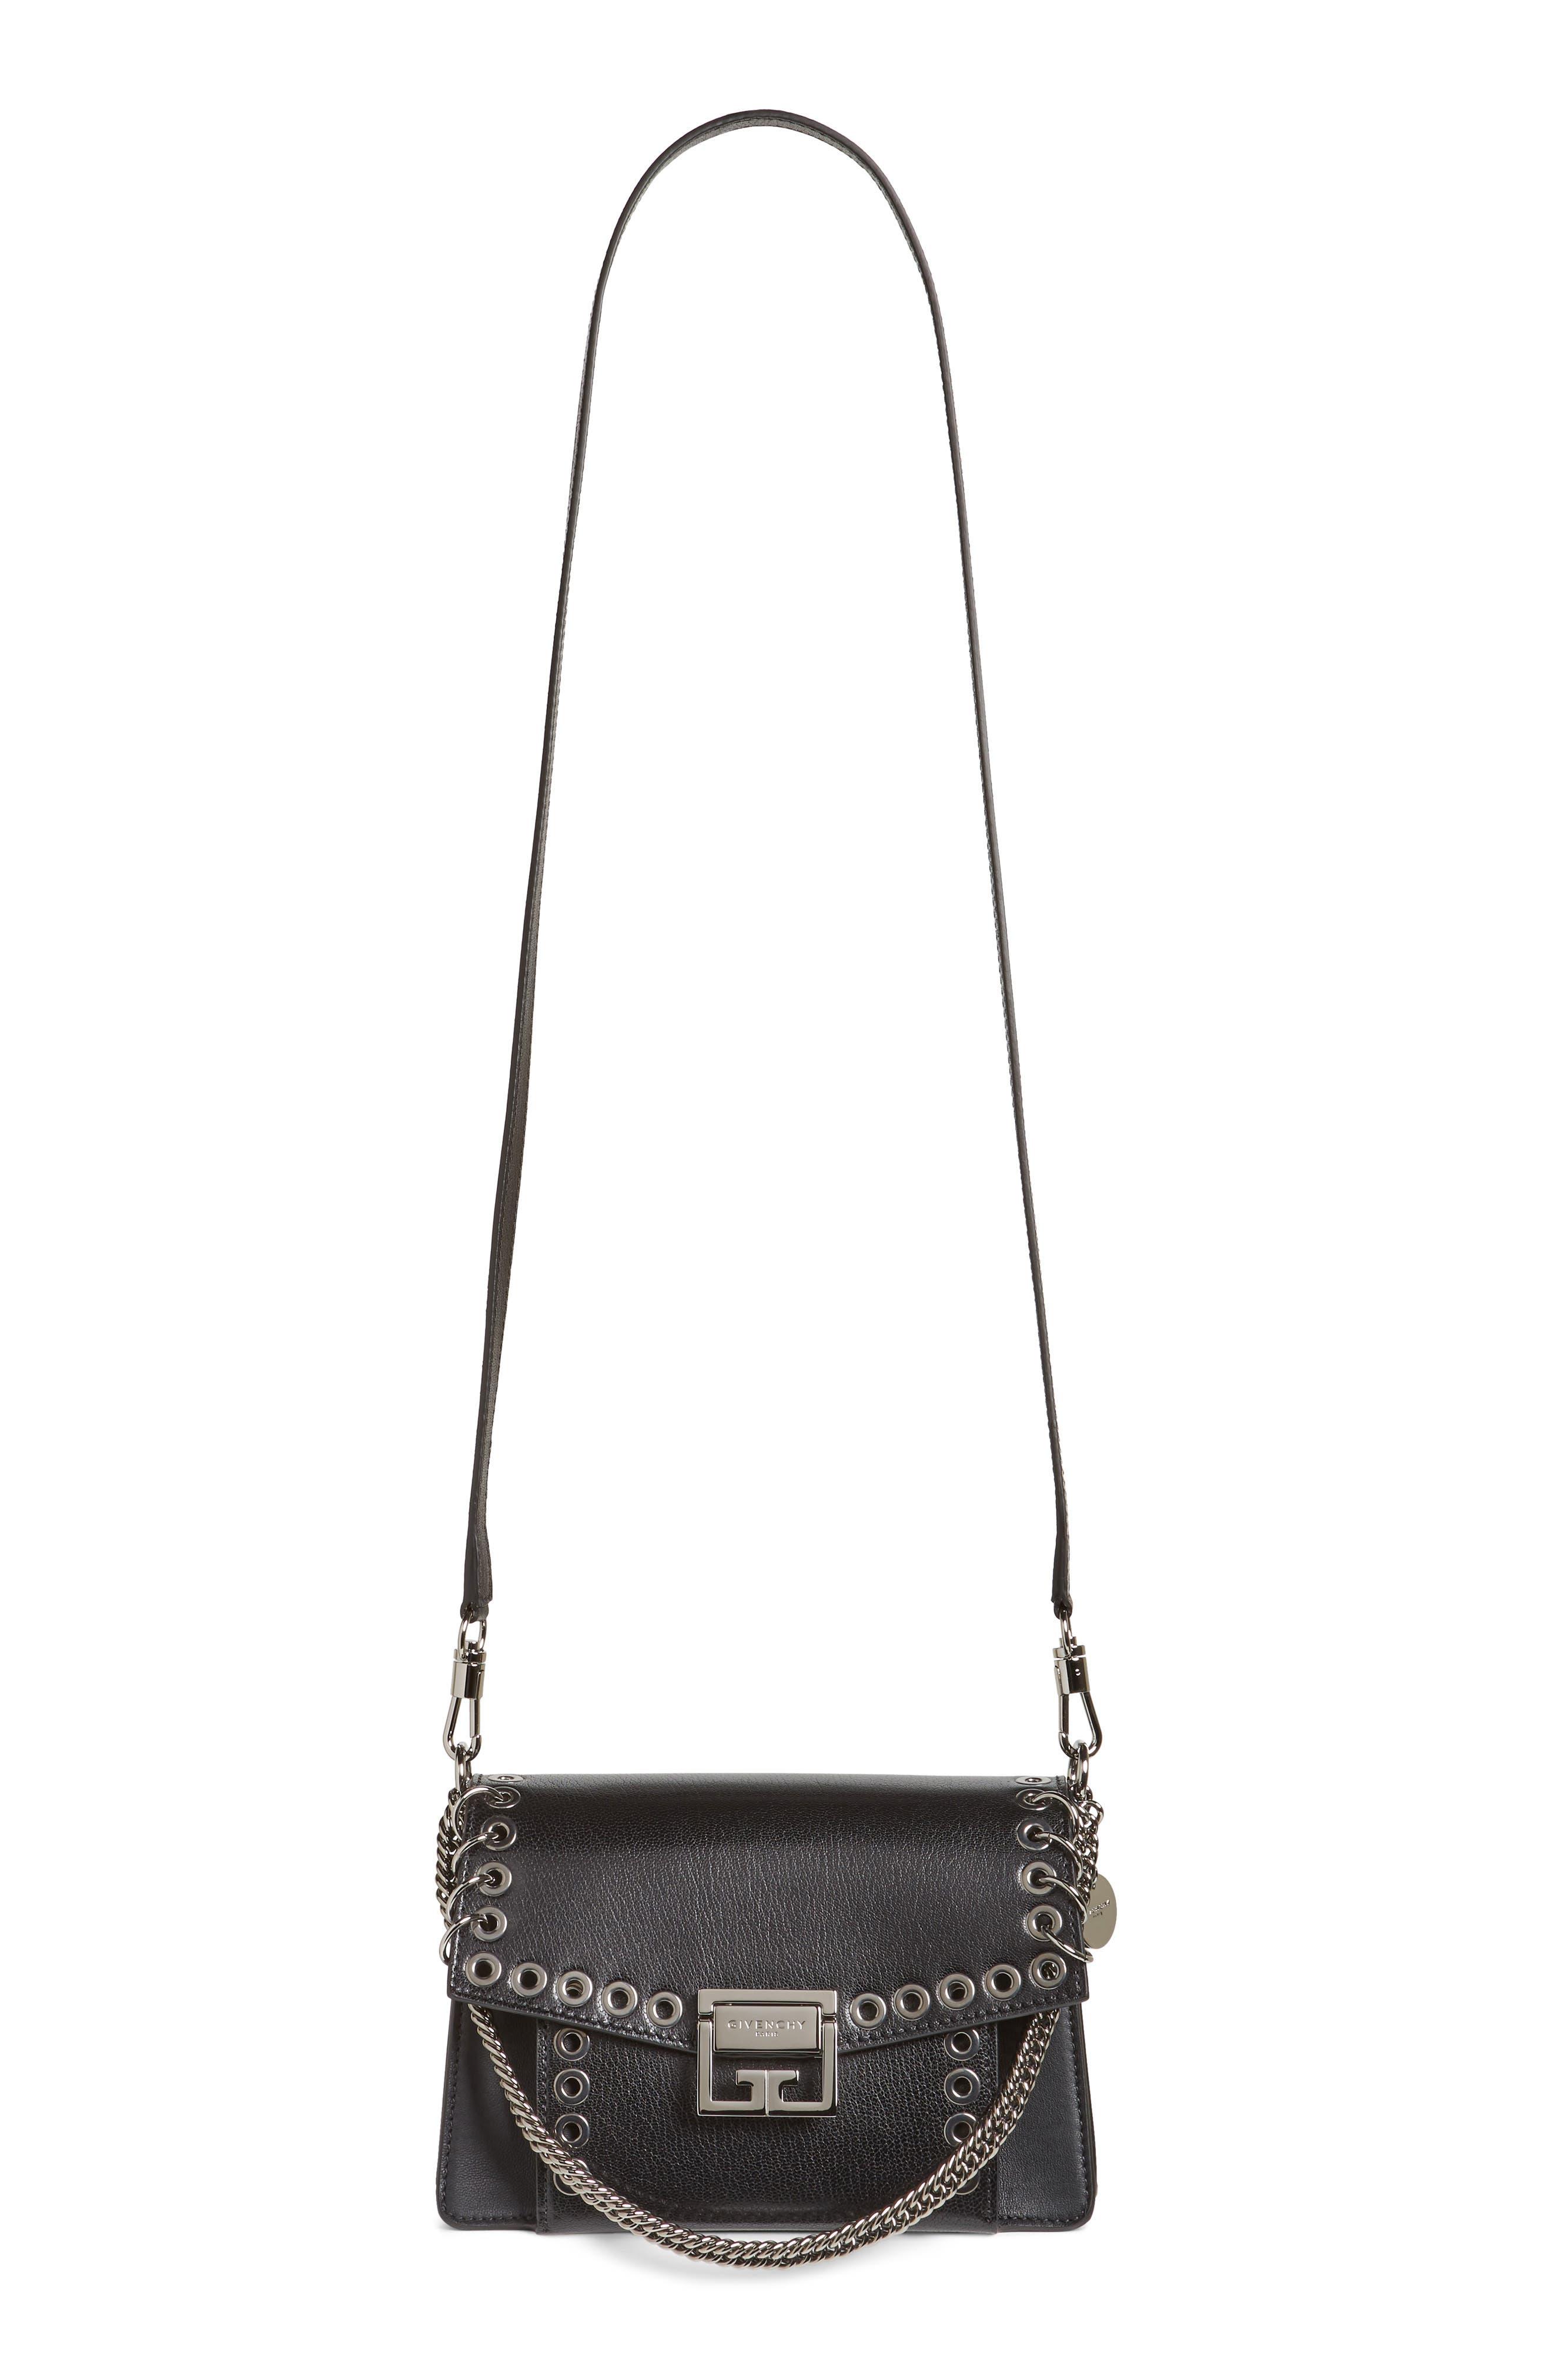 GIVENCHY,                             GV3 Eyelet and Rings Leather Shoulder Bag,                             Main thumbnail 1, color,                             BLACK